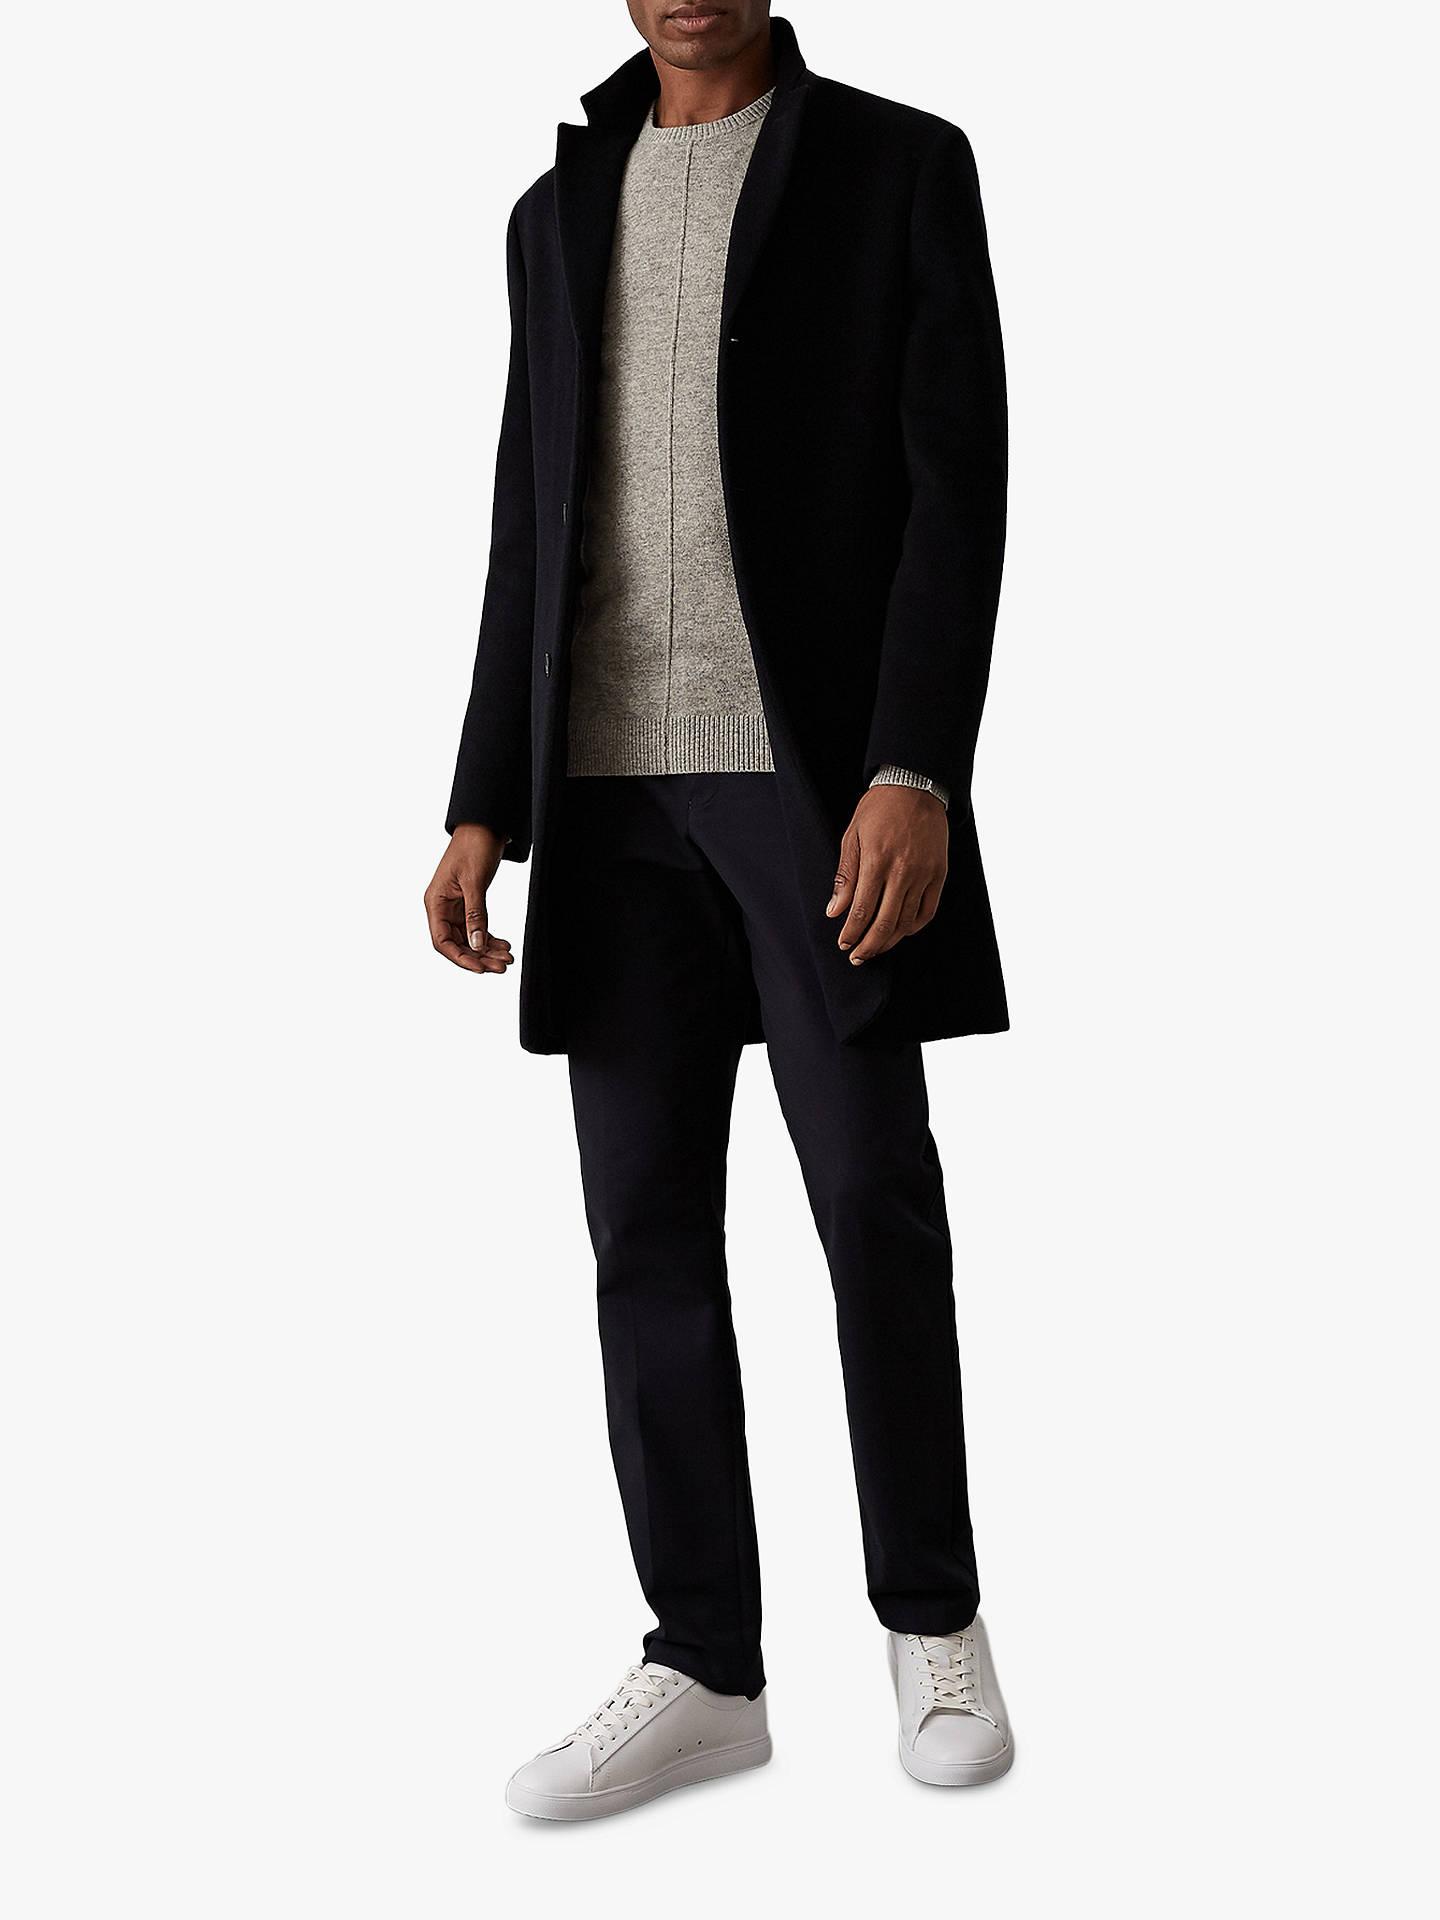 b057464c8c9 ... Buy Reiss Champion Wool Cashmere Jumper, Grey, S Online at  johnlewis.com ...